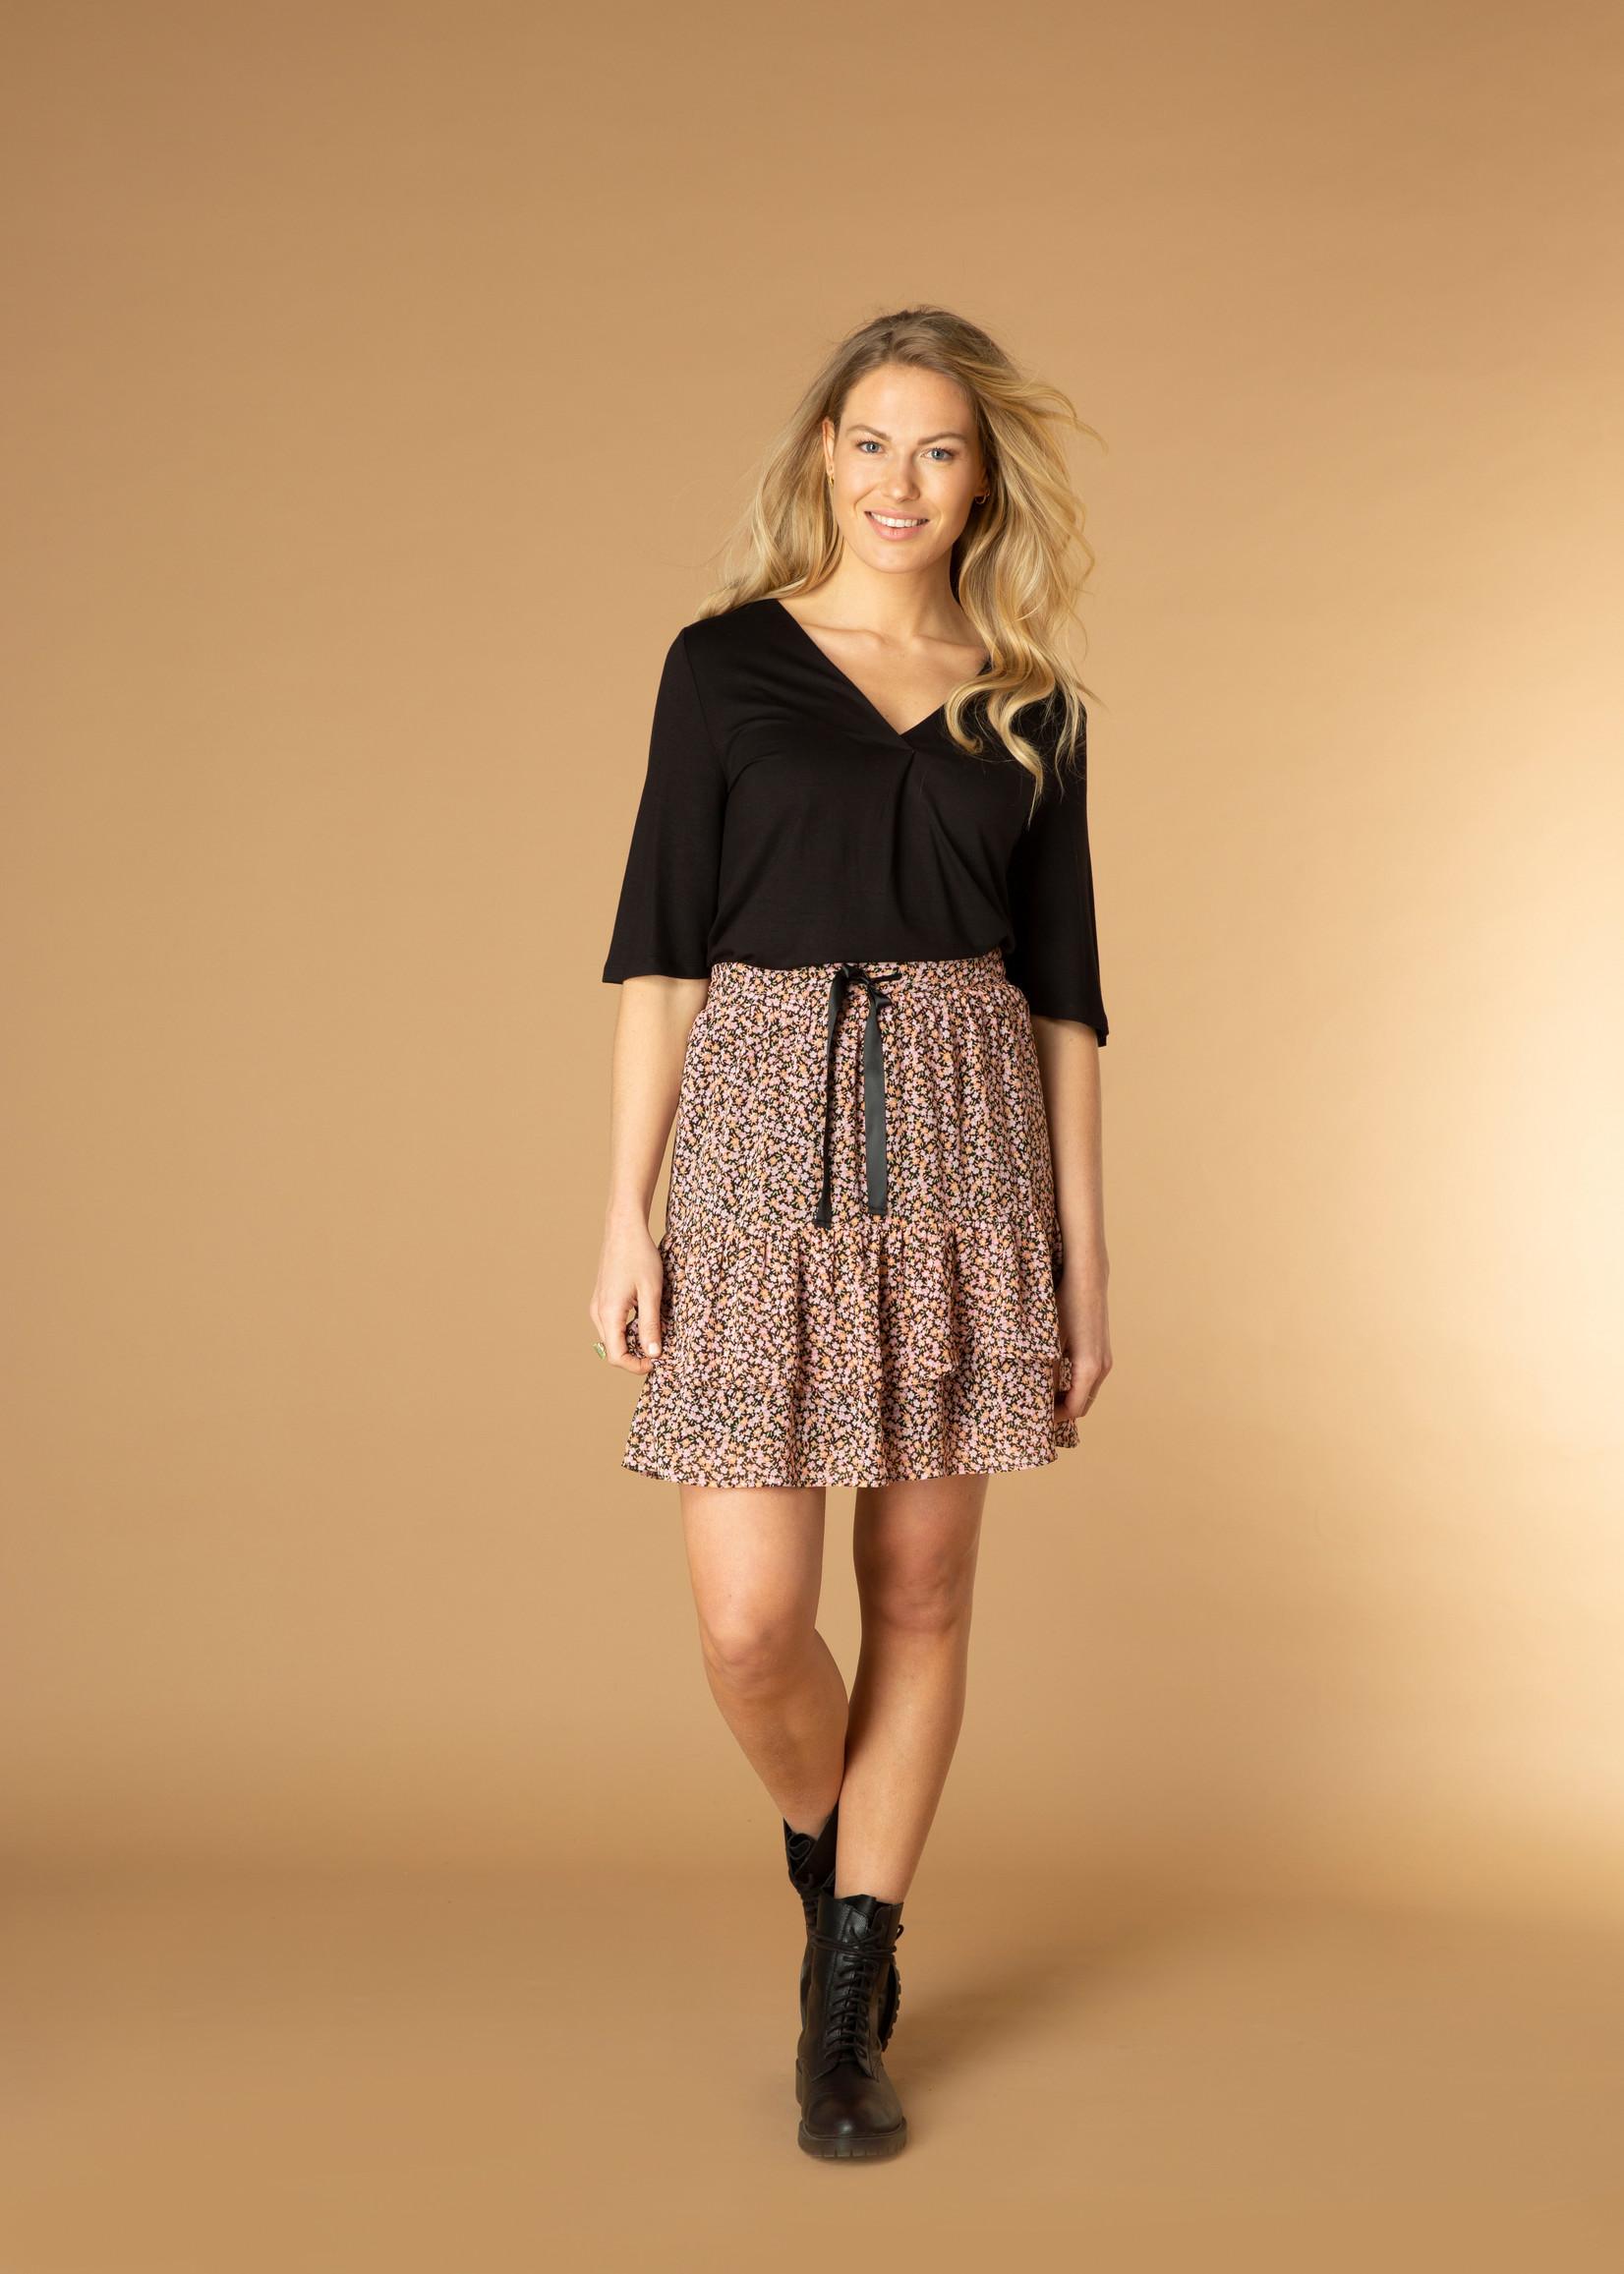 Ivy Beau Ivy Beau Rickie Skirt